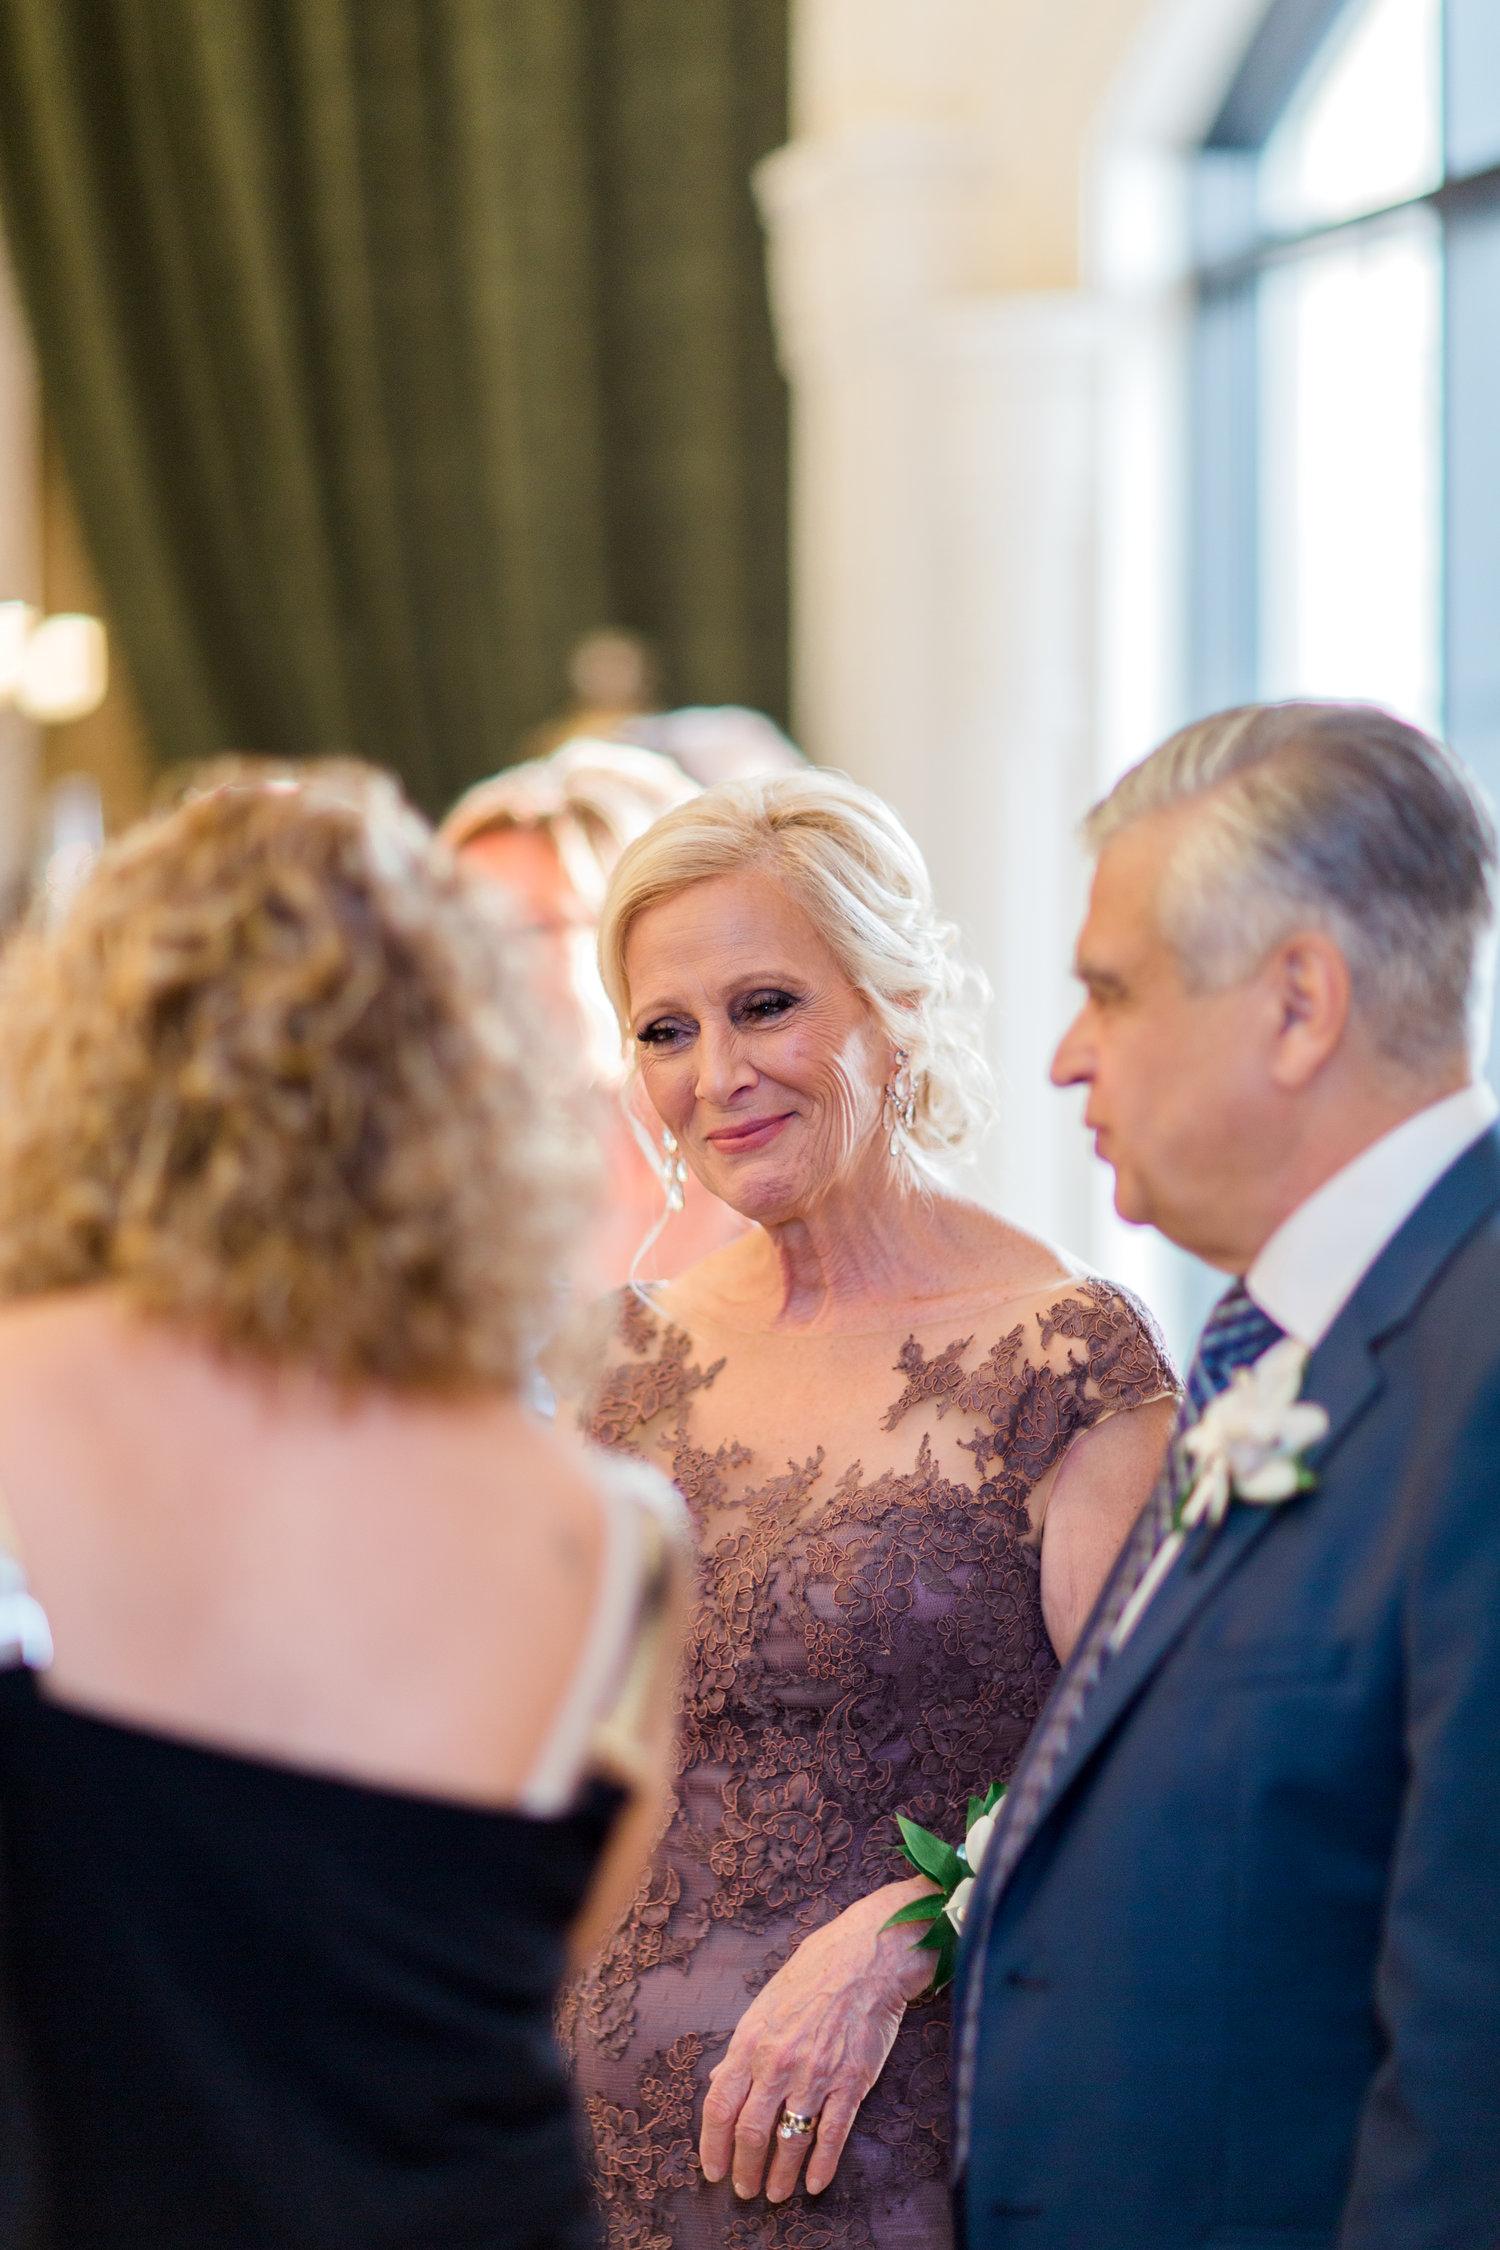 Danielle-Giroux-Amir-Golbazi-Toronto-Wedding-Photographer-Bellvue-Manor_DeLuca_2-170.jpg